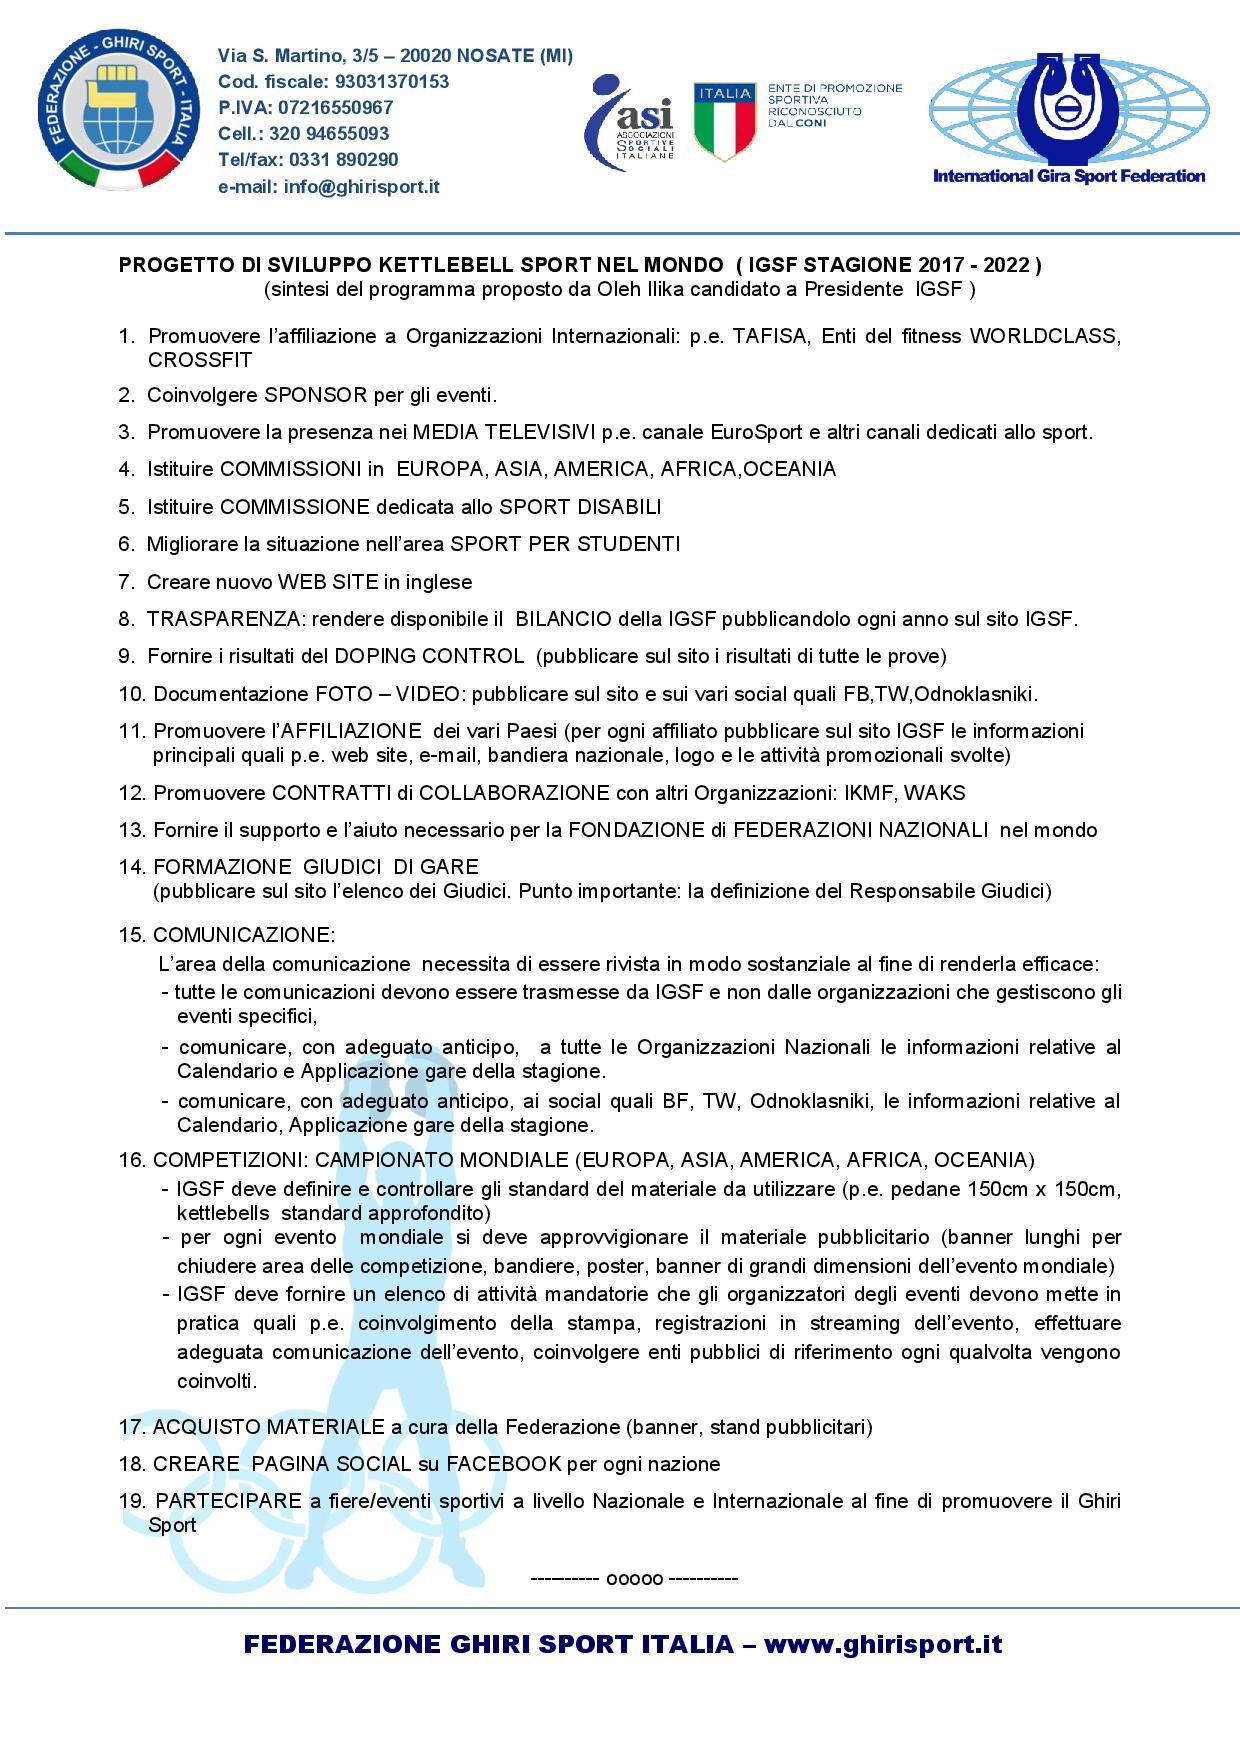 Progetto candidatura IGSF Oleh Ilika_03-08-2017_ITA